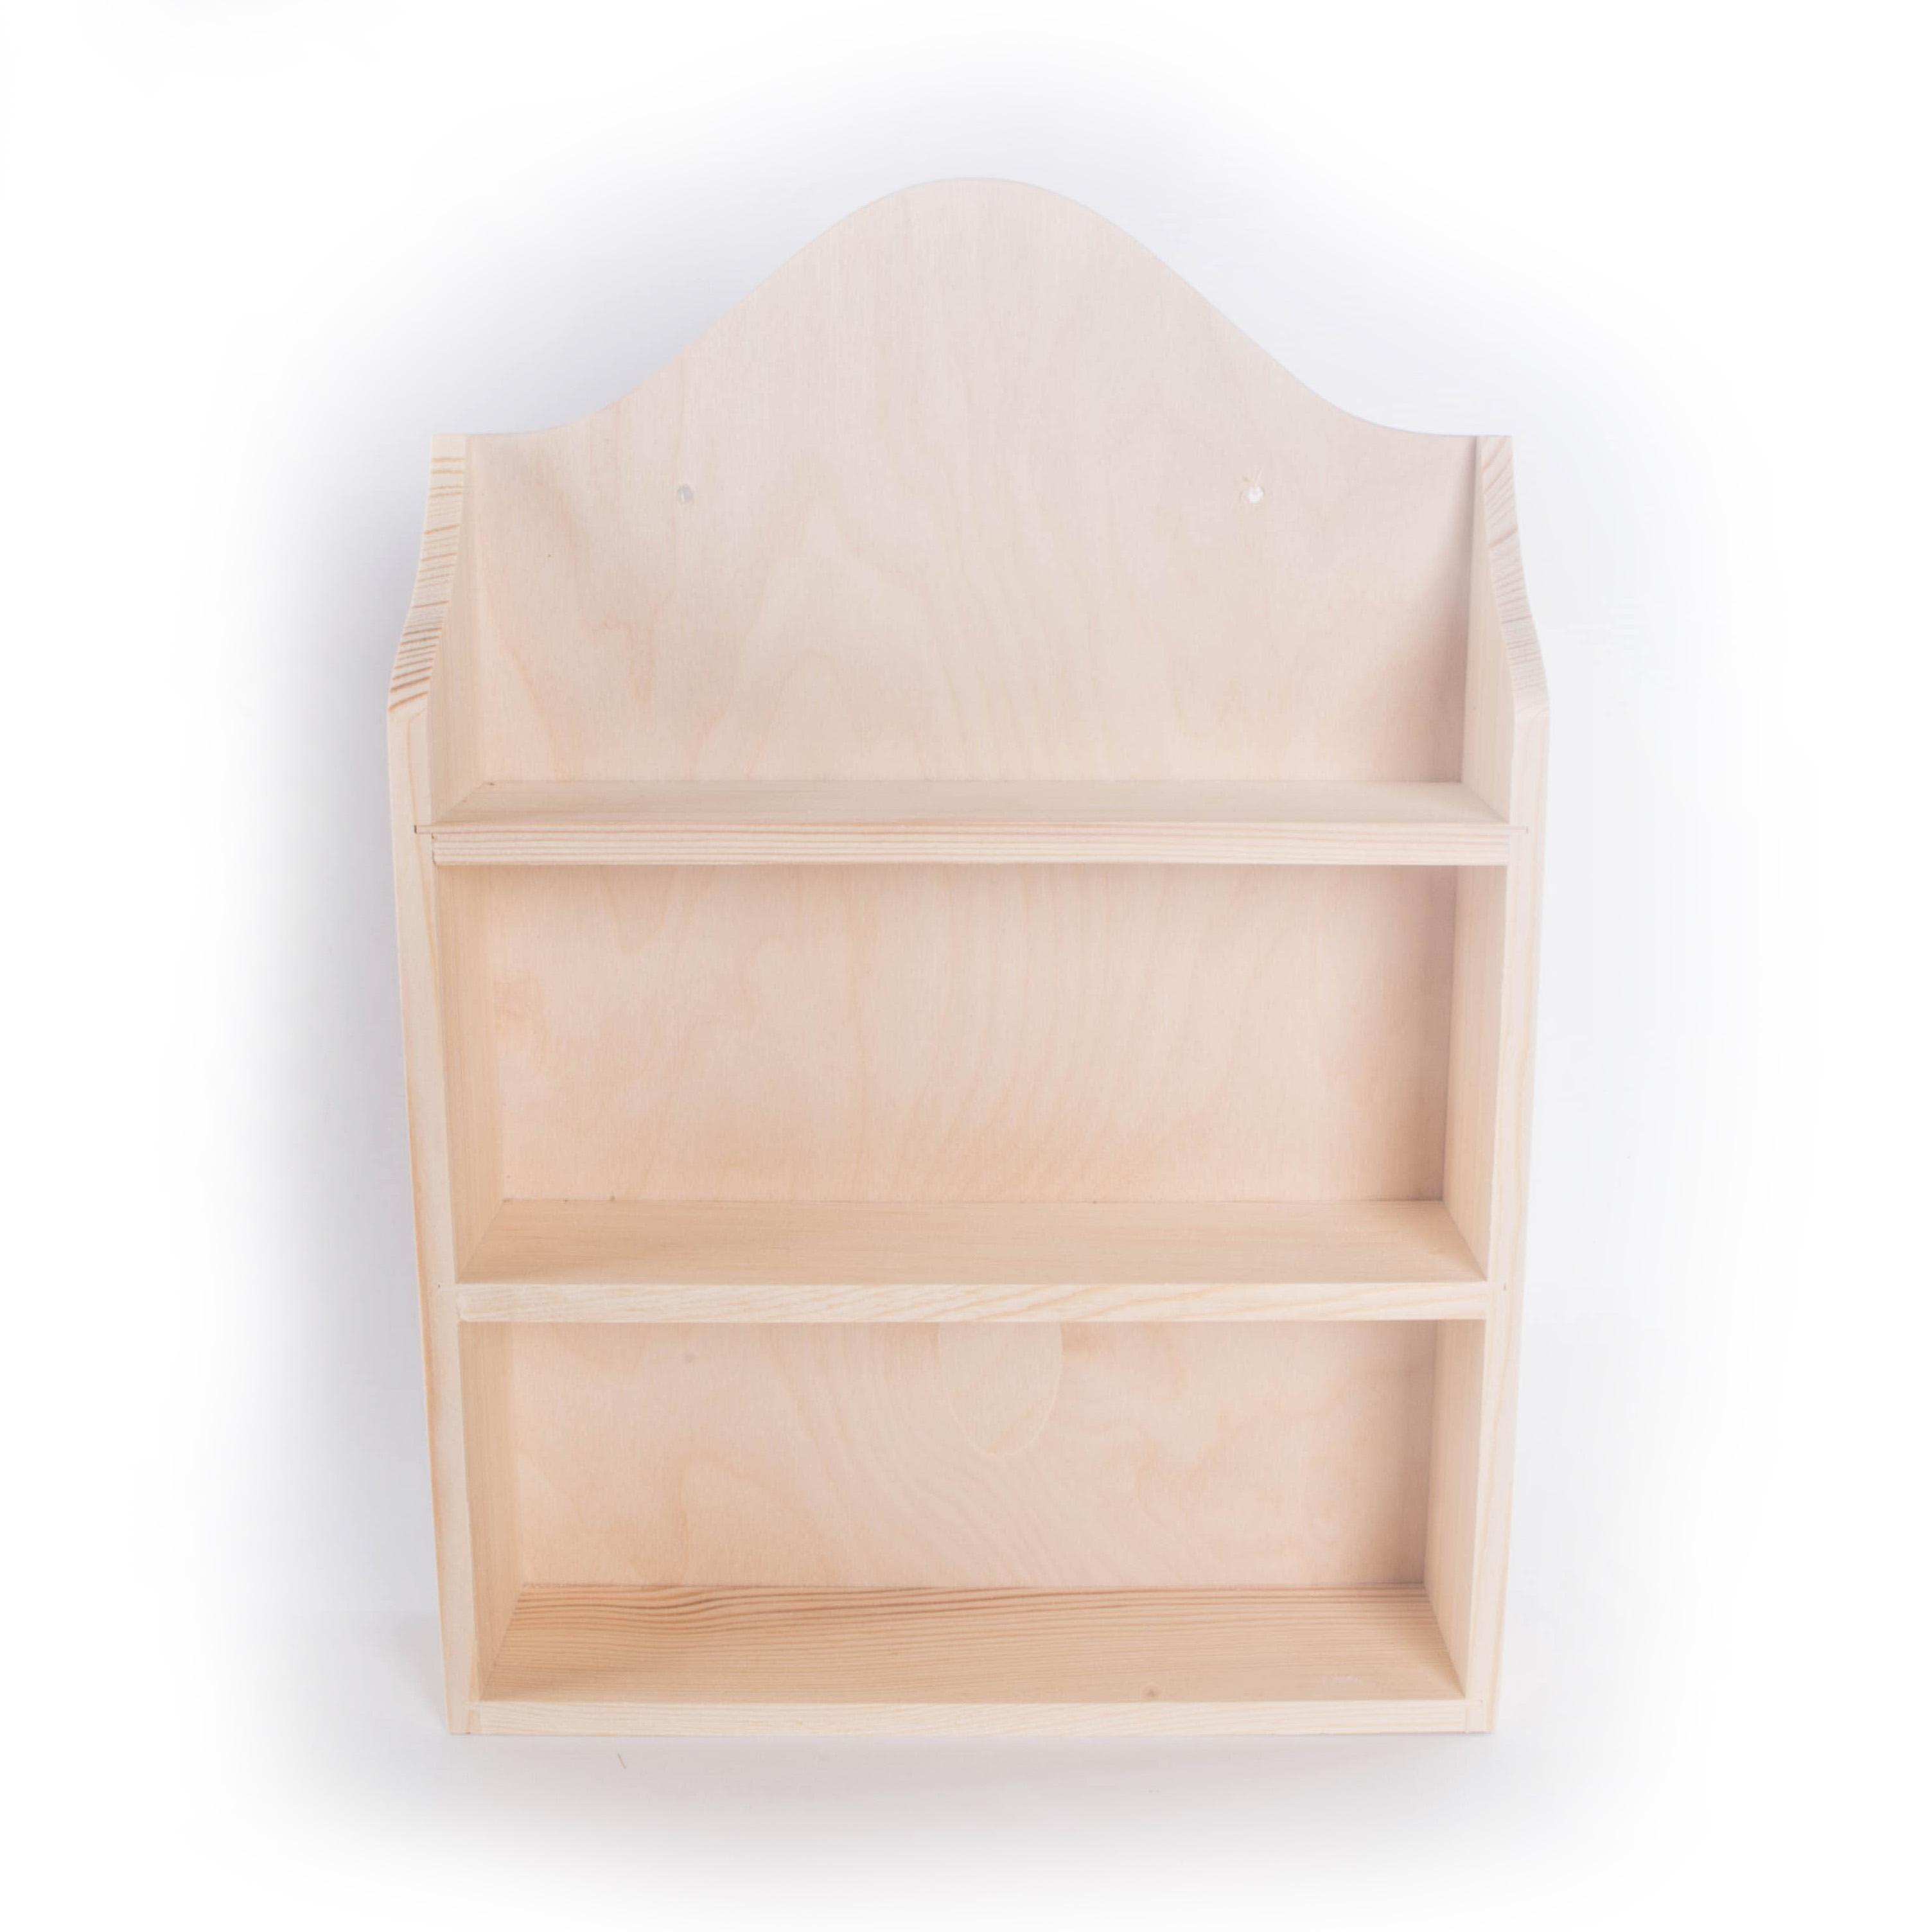 Details About Wooden Spice Rack Craft Natural Wood Shelves Storage Display Pine Shelving